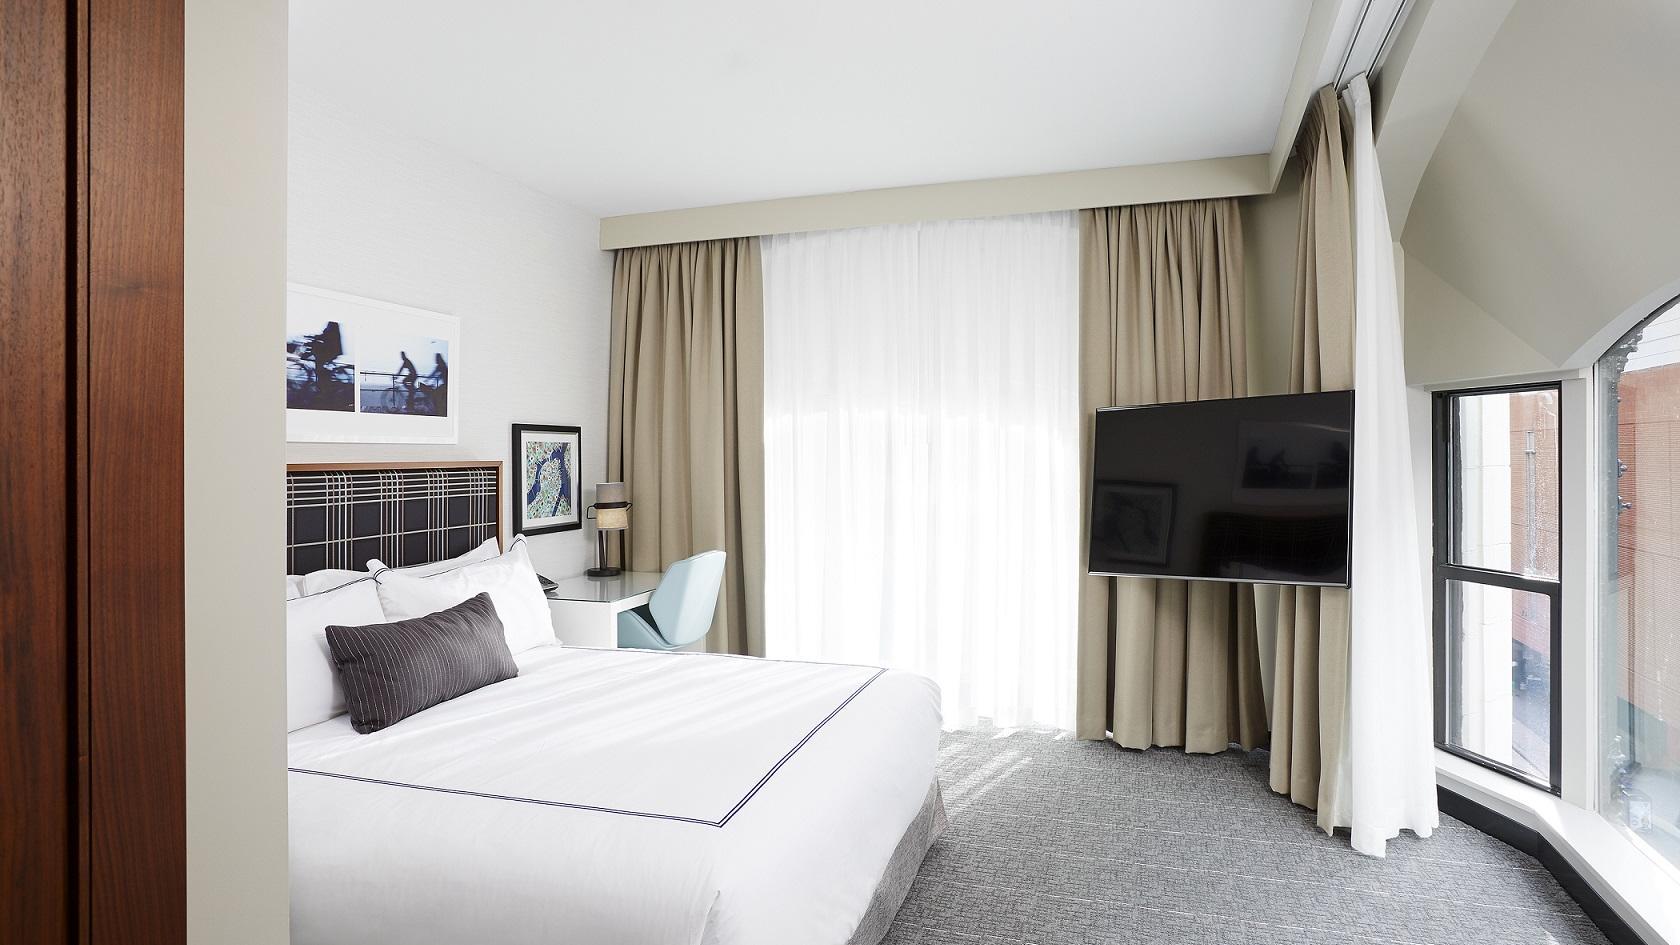 King Bedroom Godfrey Boston Hotel Rooms